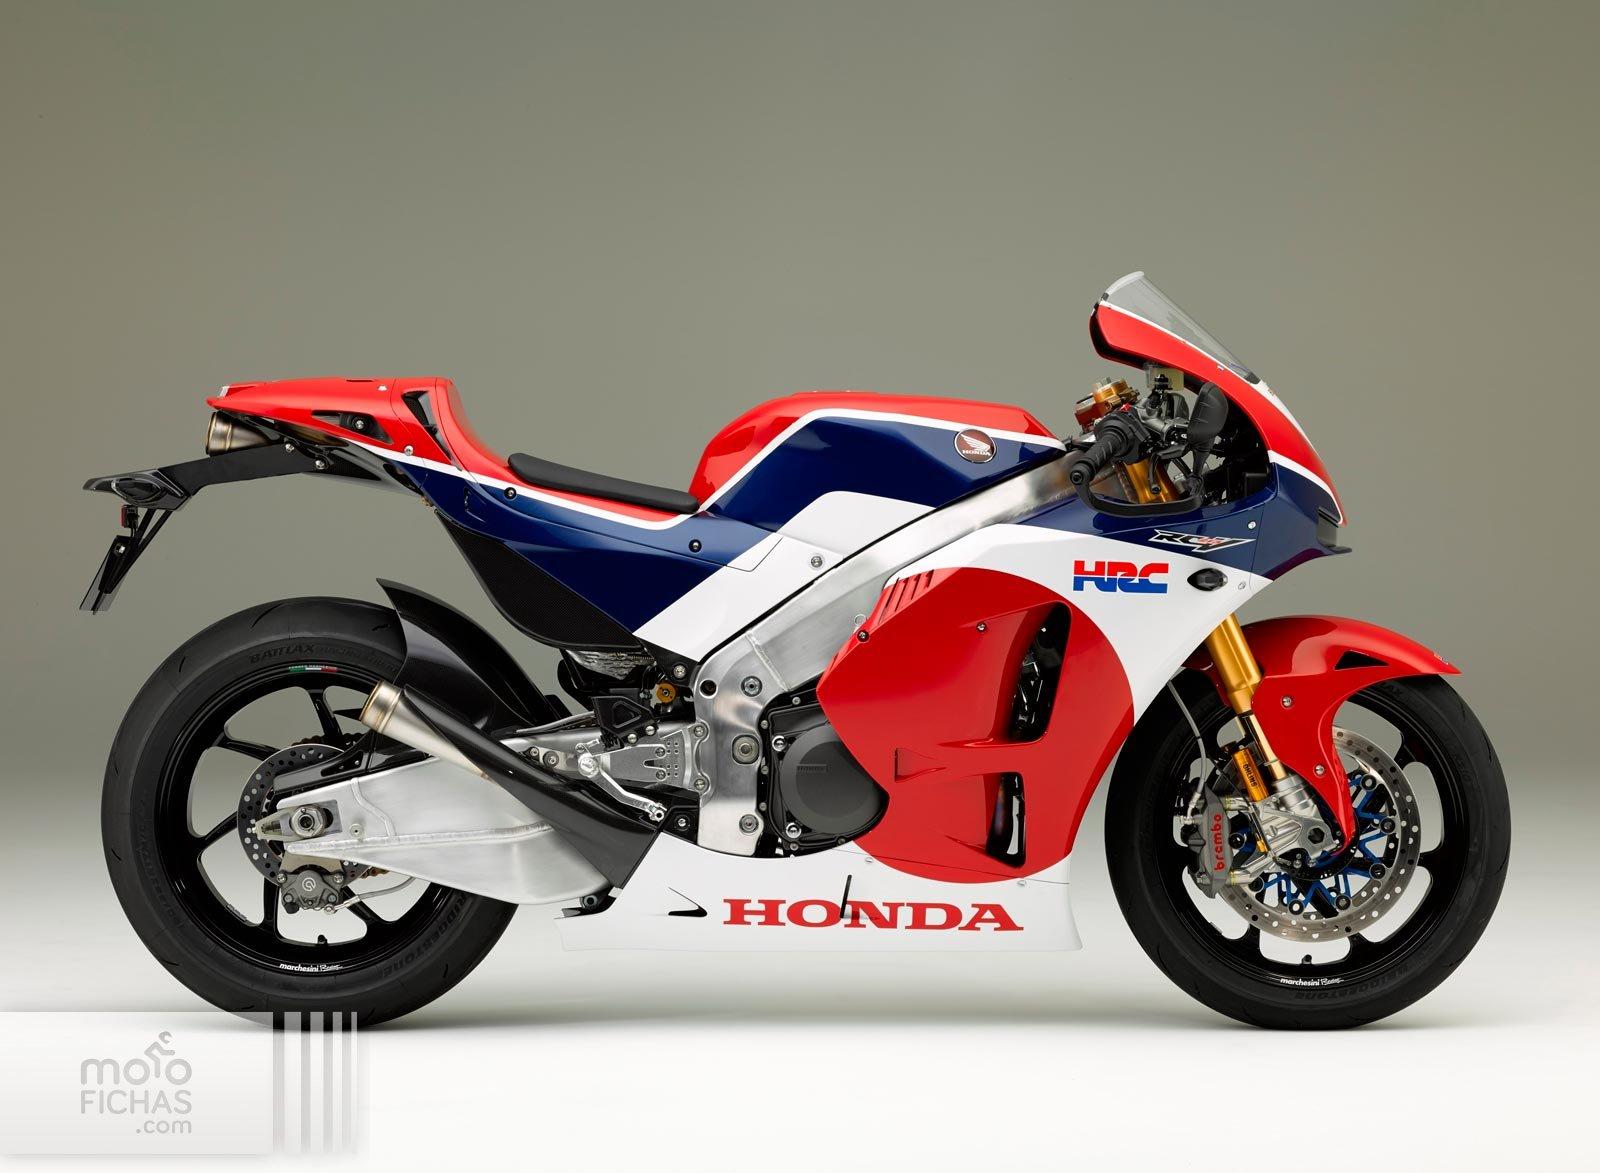 01 lateral honda rc213v s motogp de calle-medium